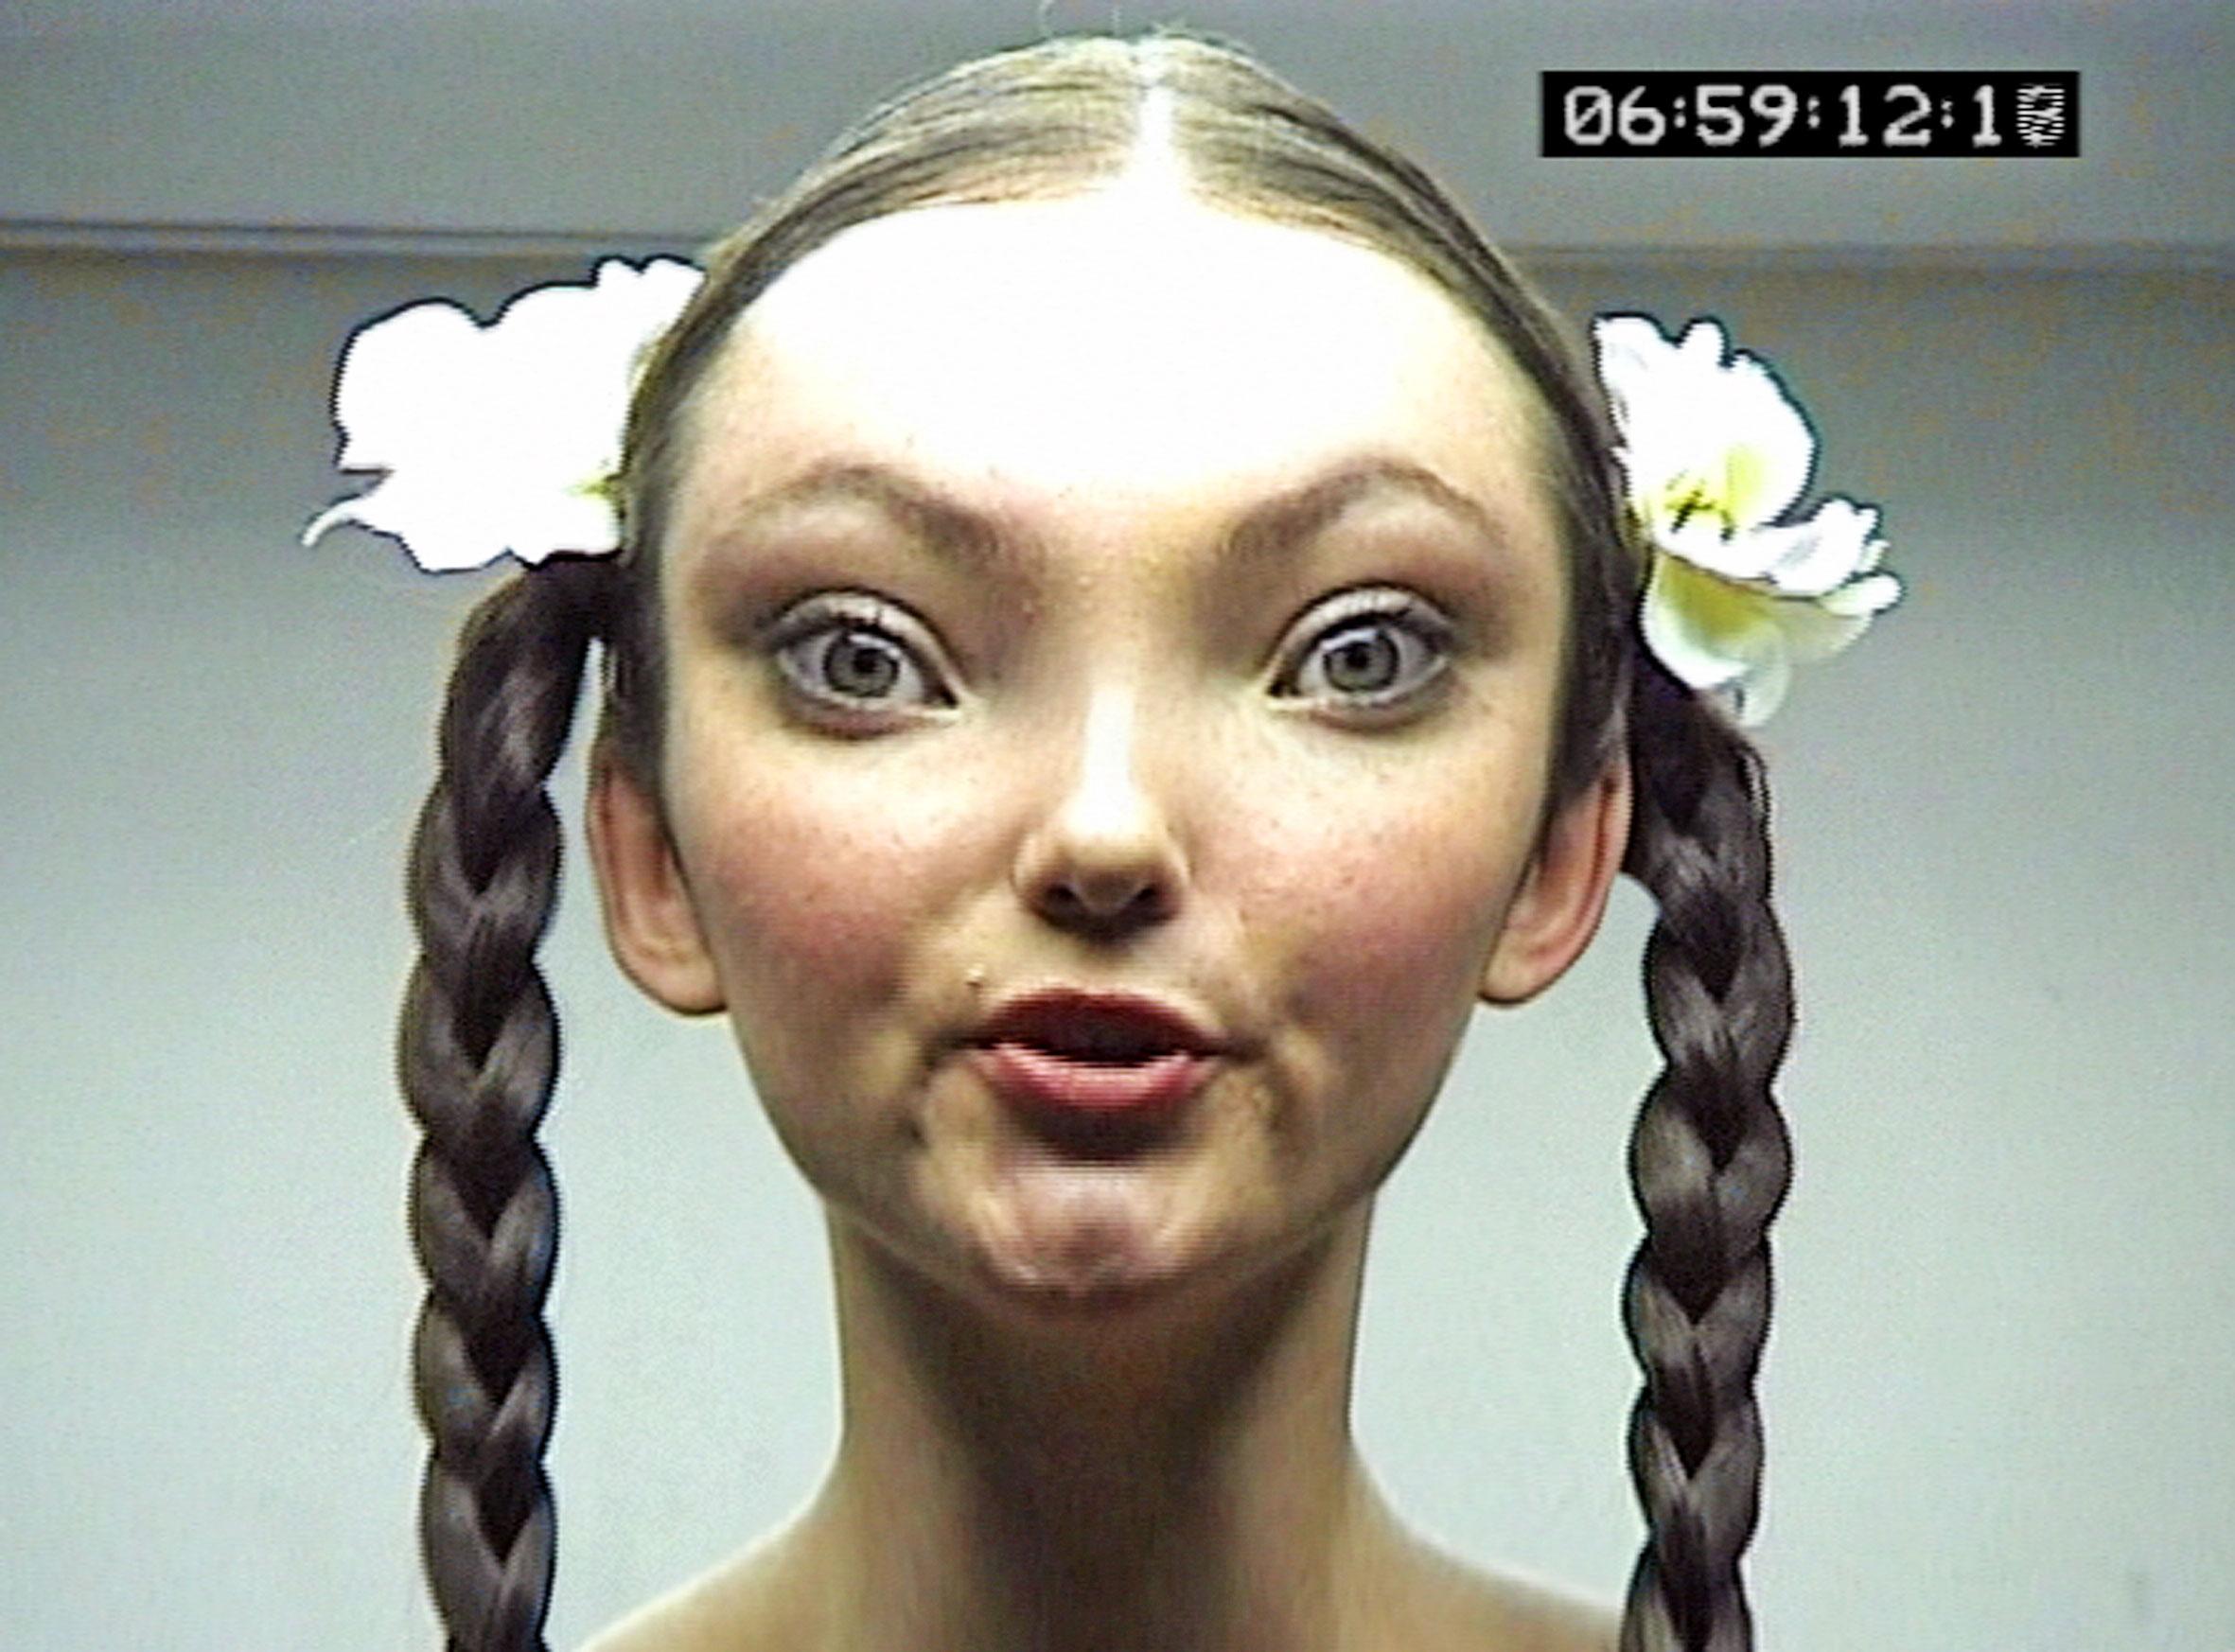 Chris Cunningham - Playstation Girl